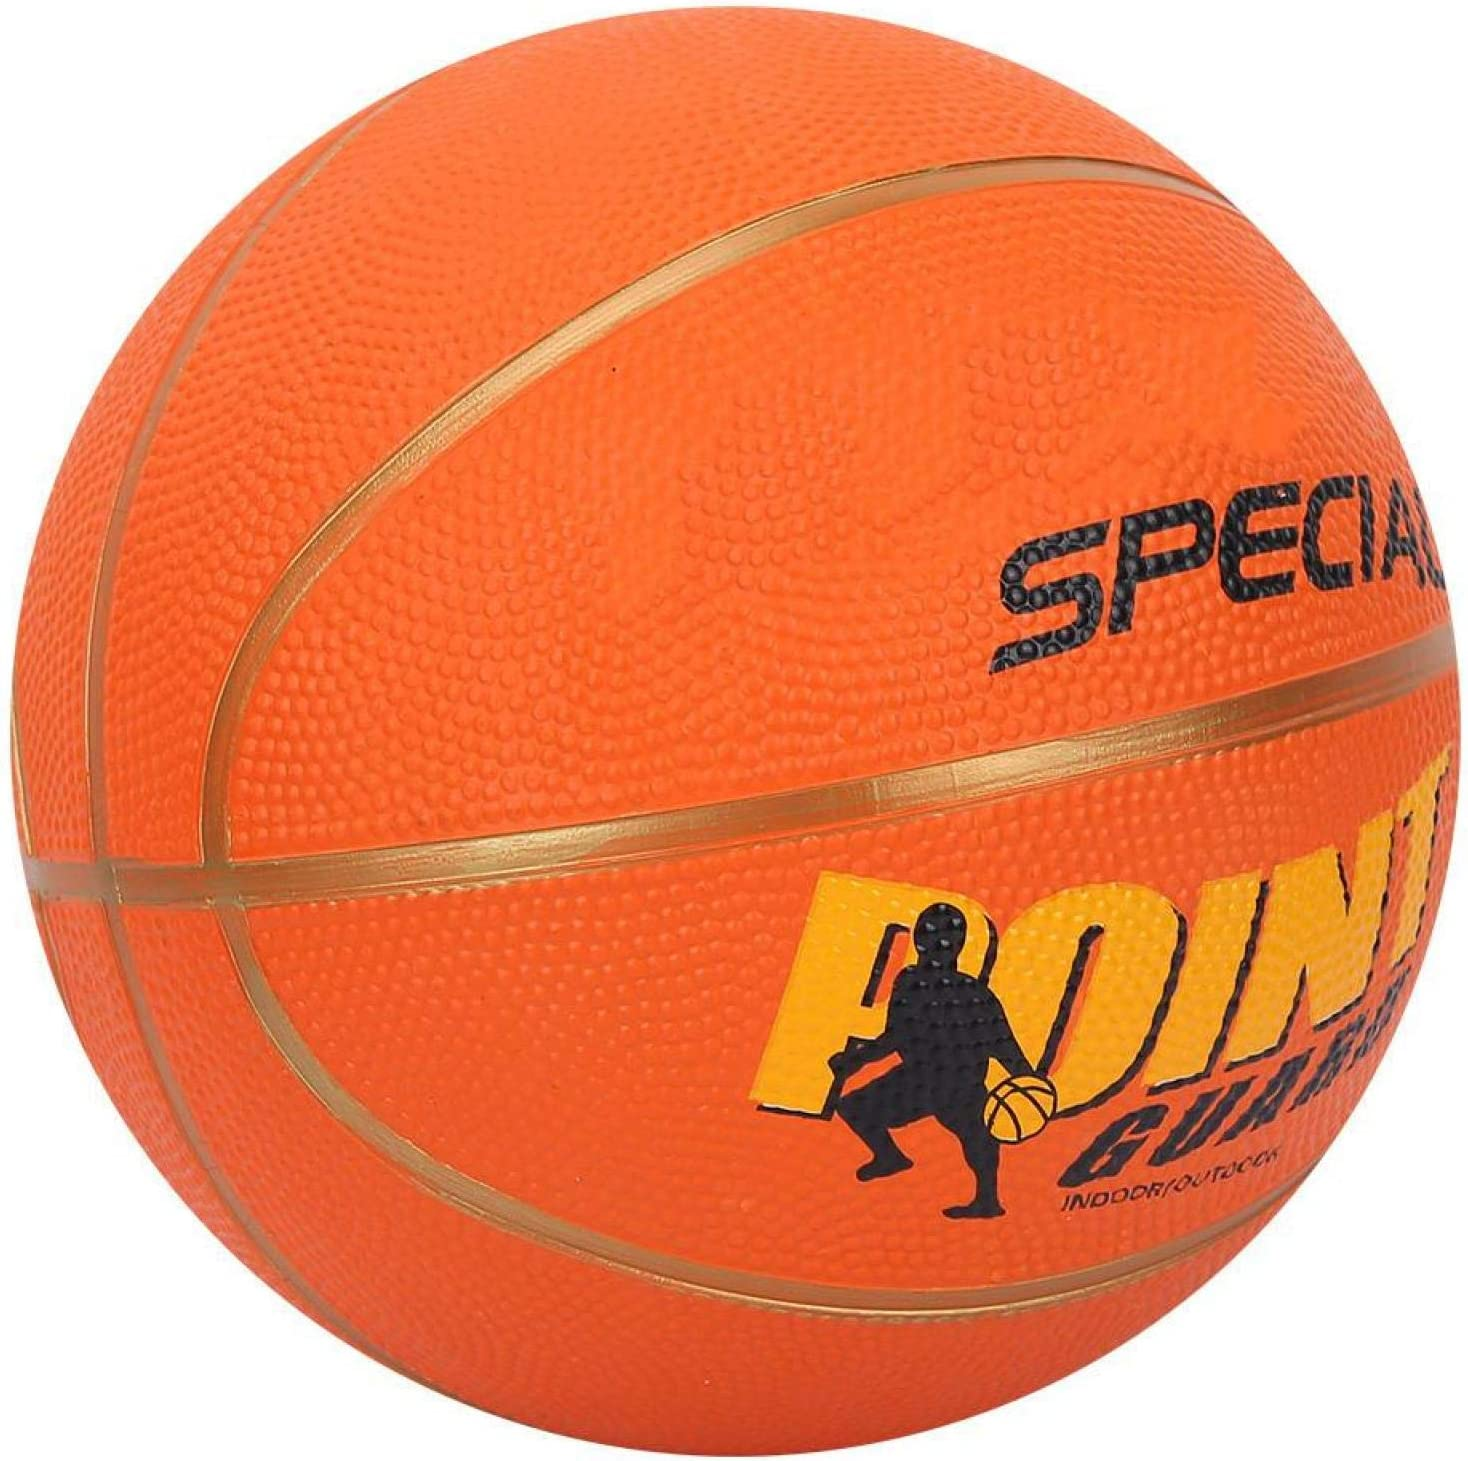 Basketball Orange Size 5 Training Same day shipping Children S High material